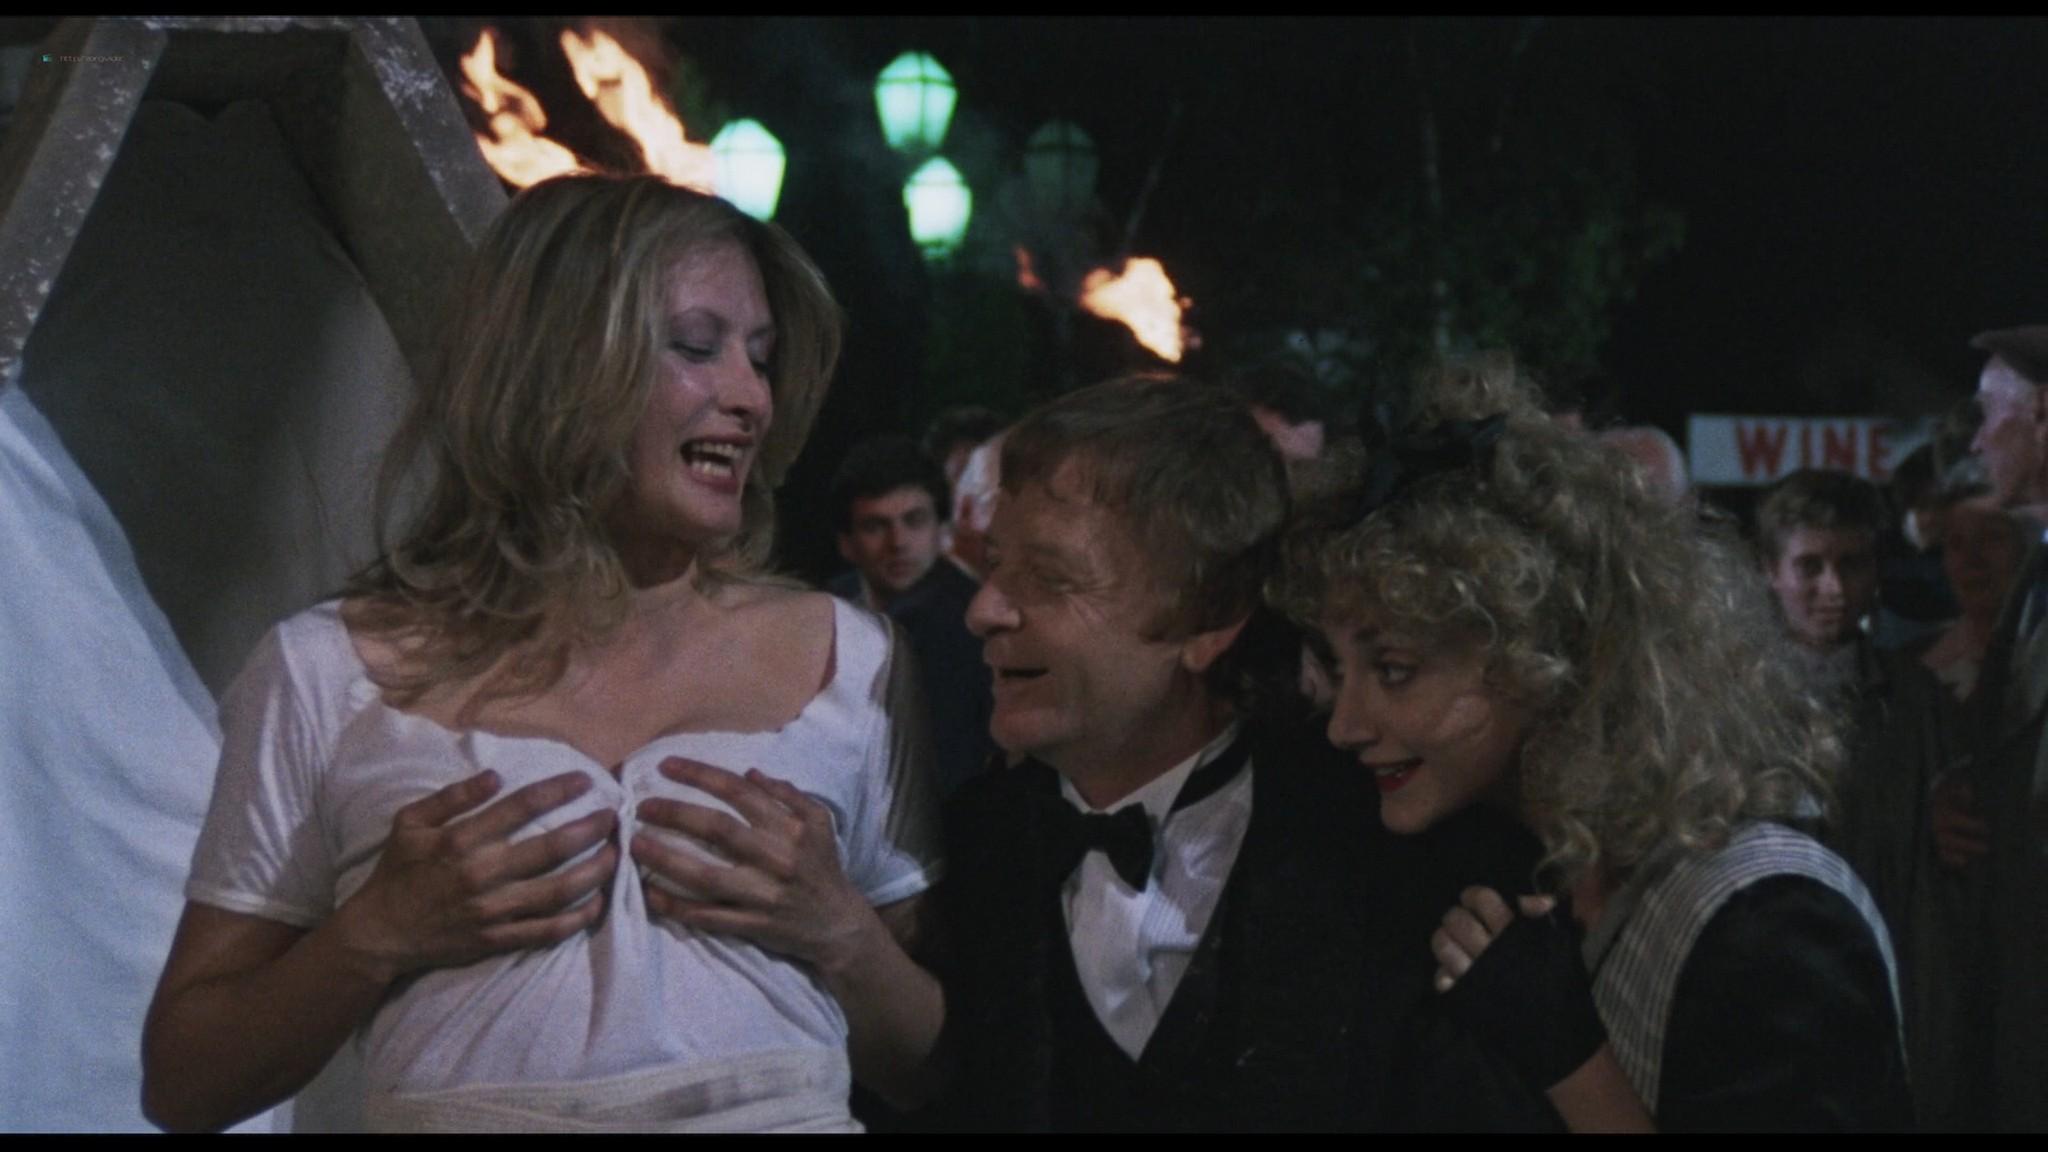 Geena Davis hot and sexy Ksenia Prohaska sexy - Transylvania 6-5000 (1985) HD 1080p BluRay (2)